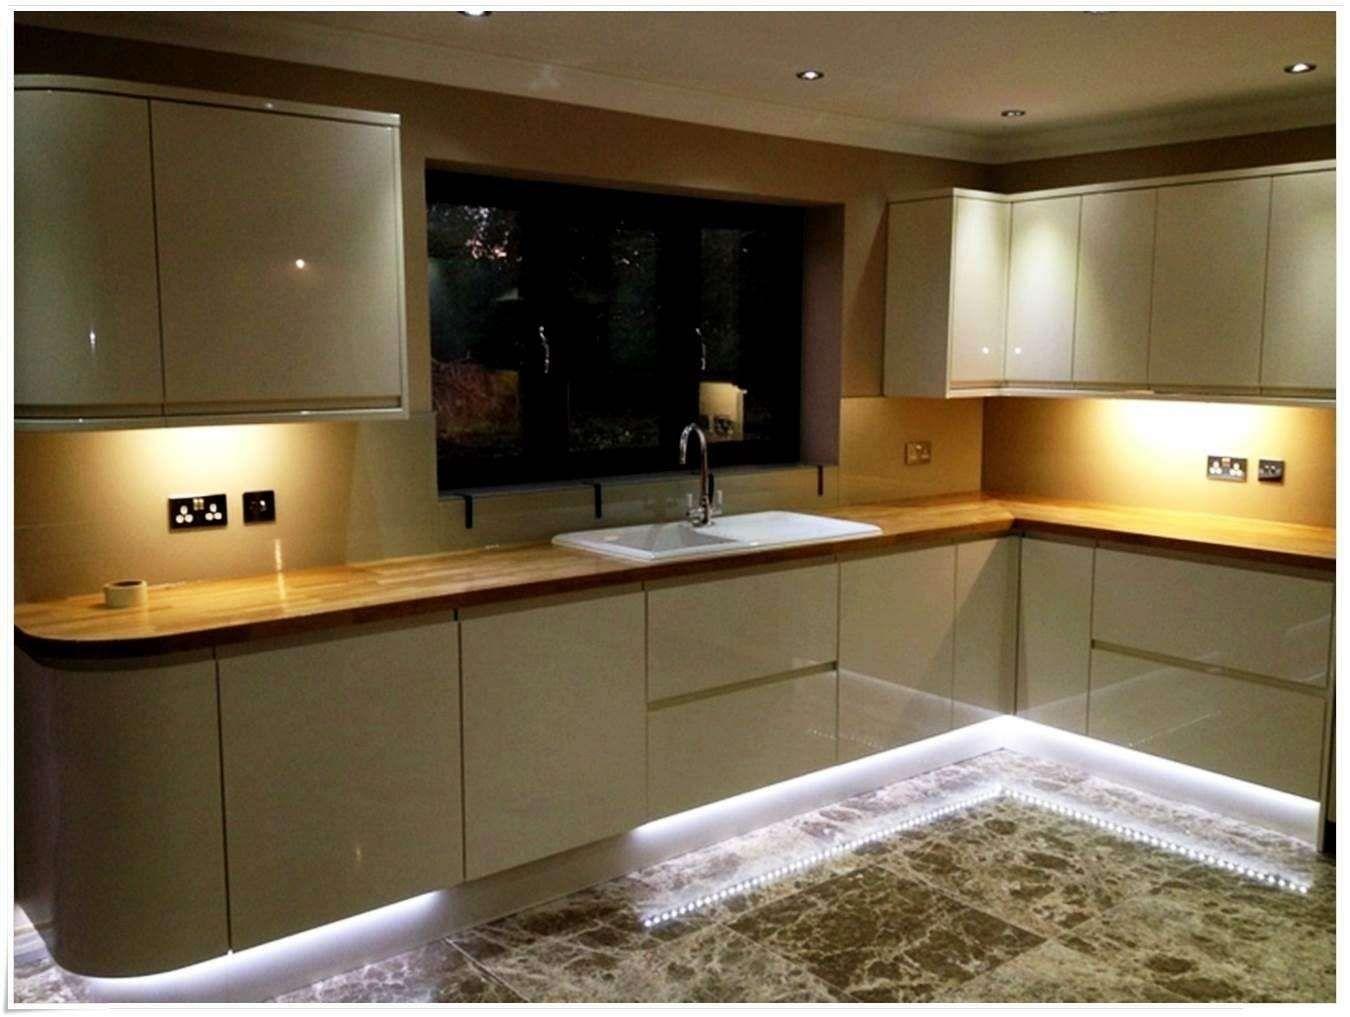 35 Elegant Arbeitsplatte Kuche Akazie Kitchen Plinth Kitchen Led Lighting Kitchen Plinth Lights